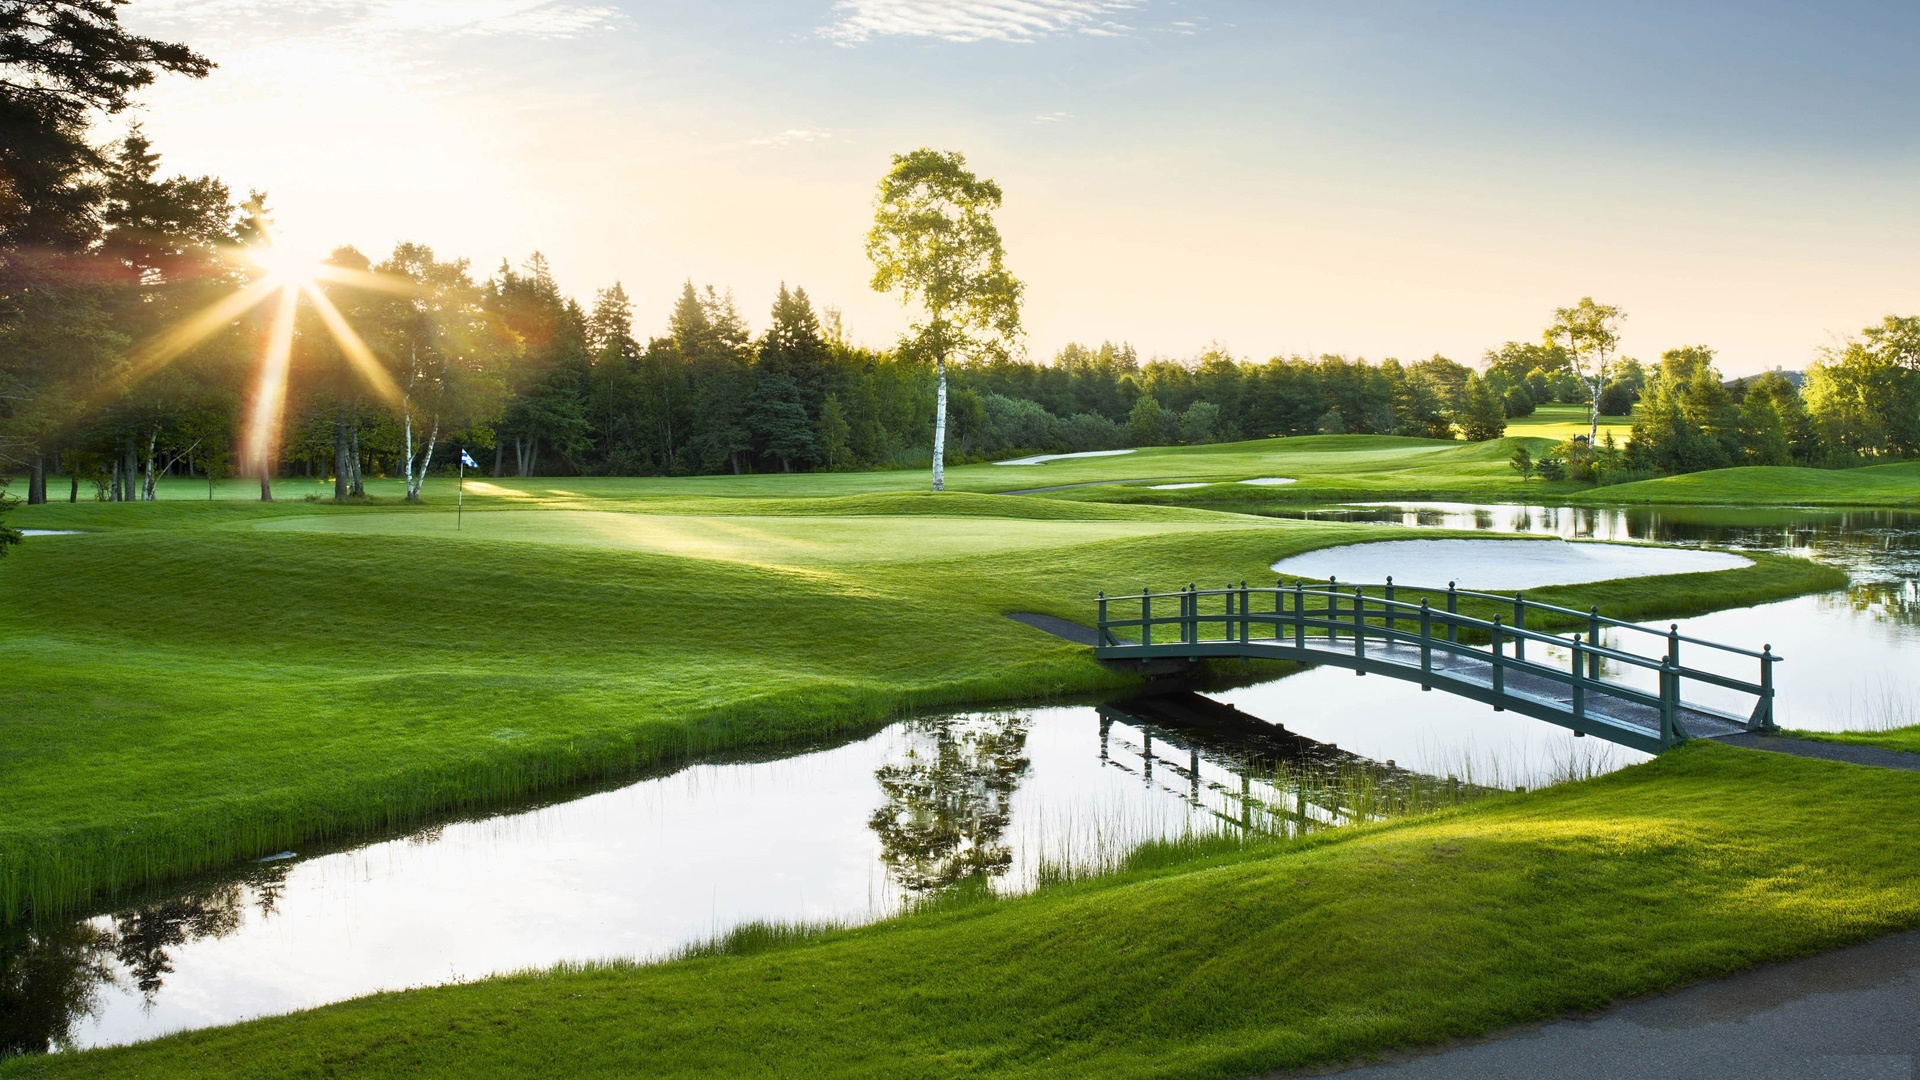 Golf Desktop Backgrounds Free